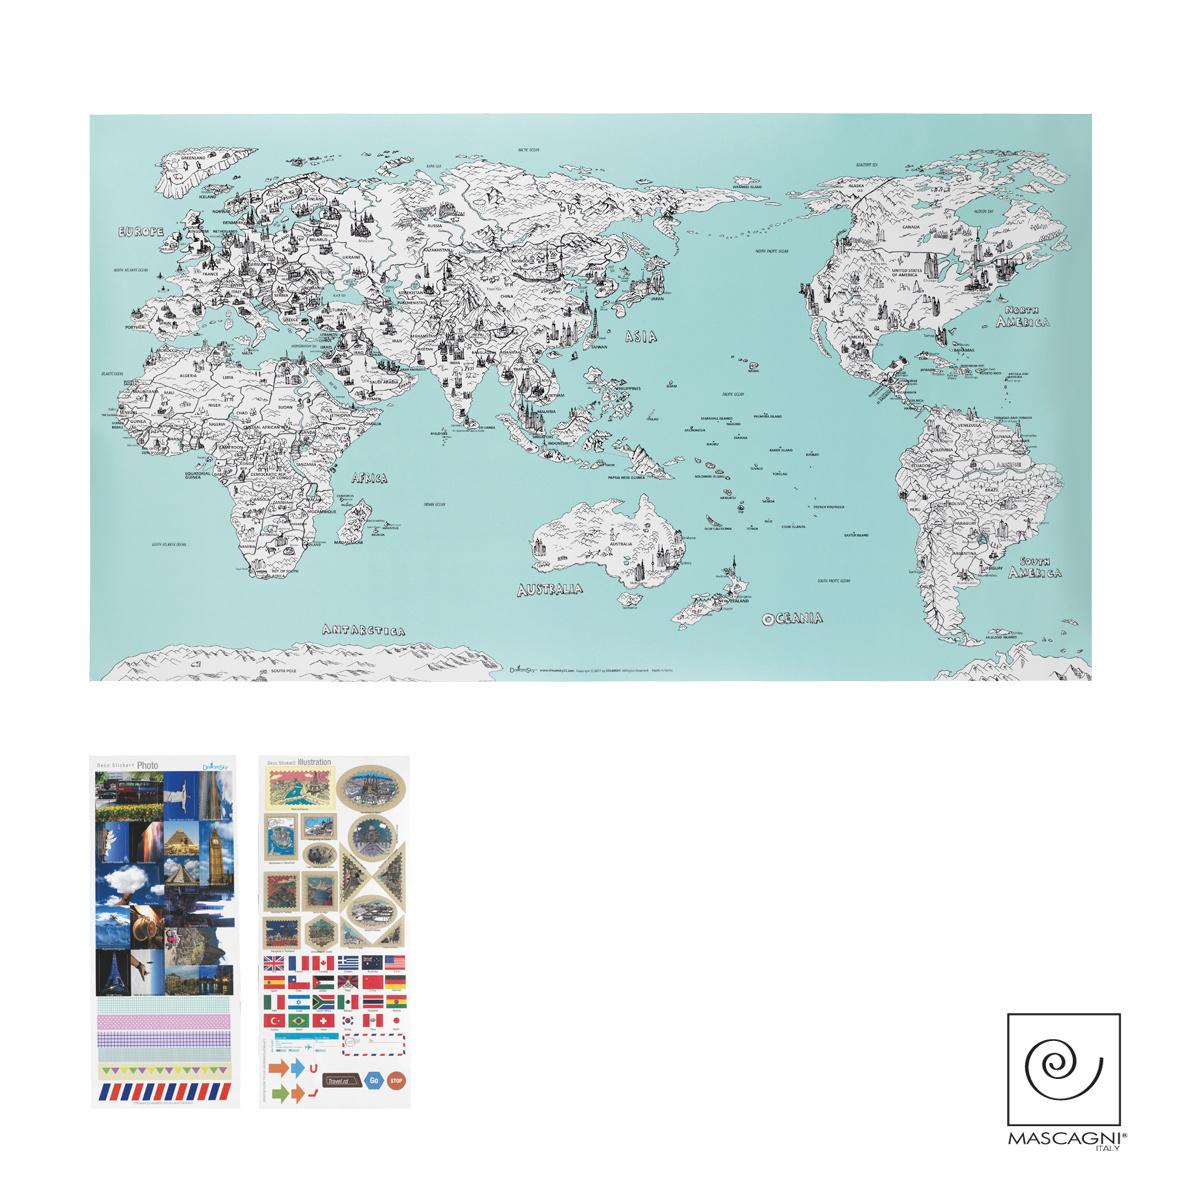 Art Mascagni A792 COLOR MAP - COL. GREEN